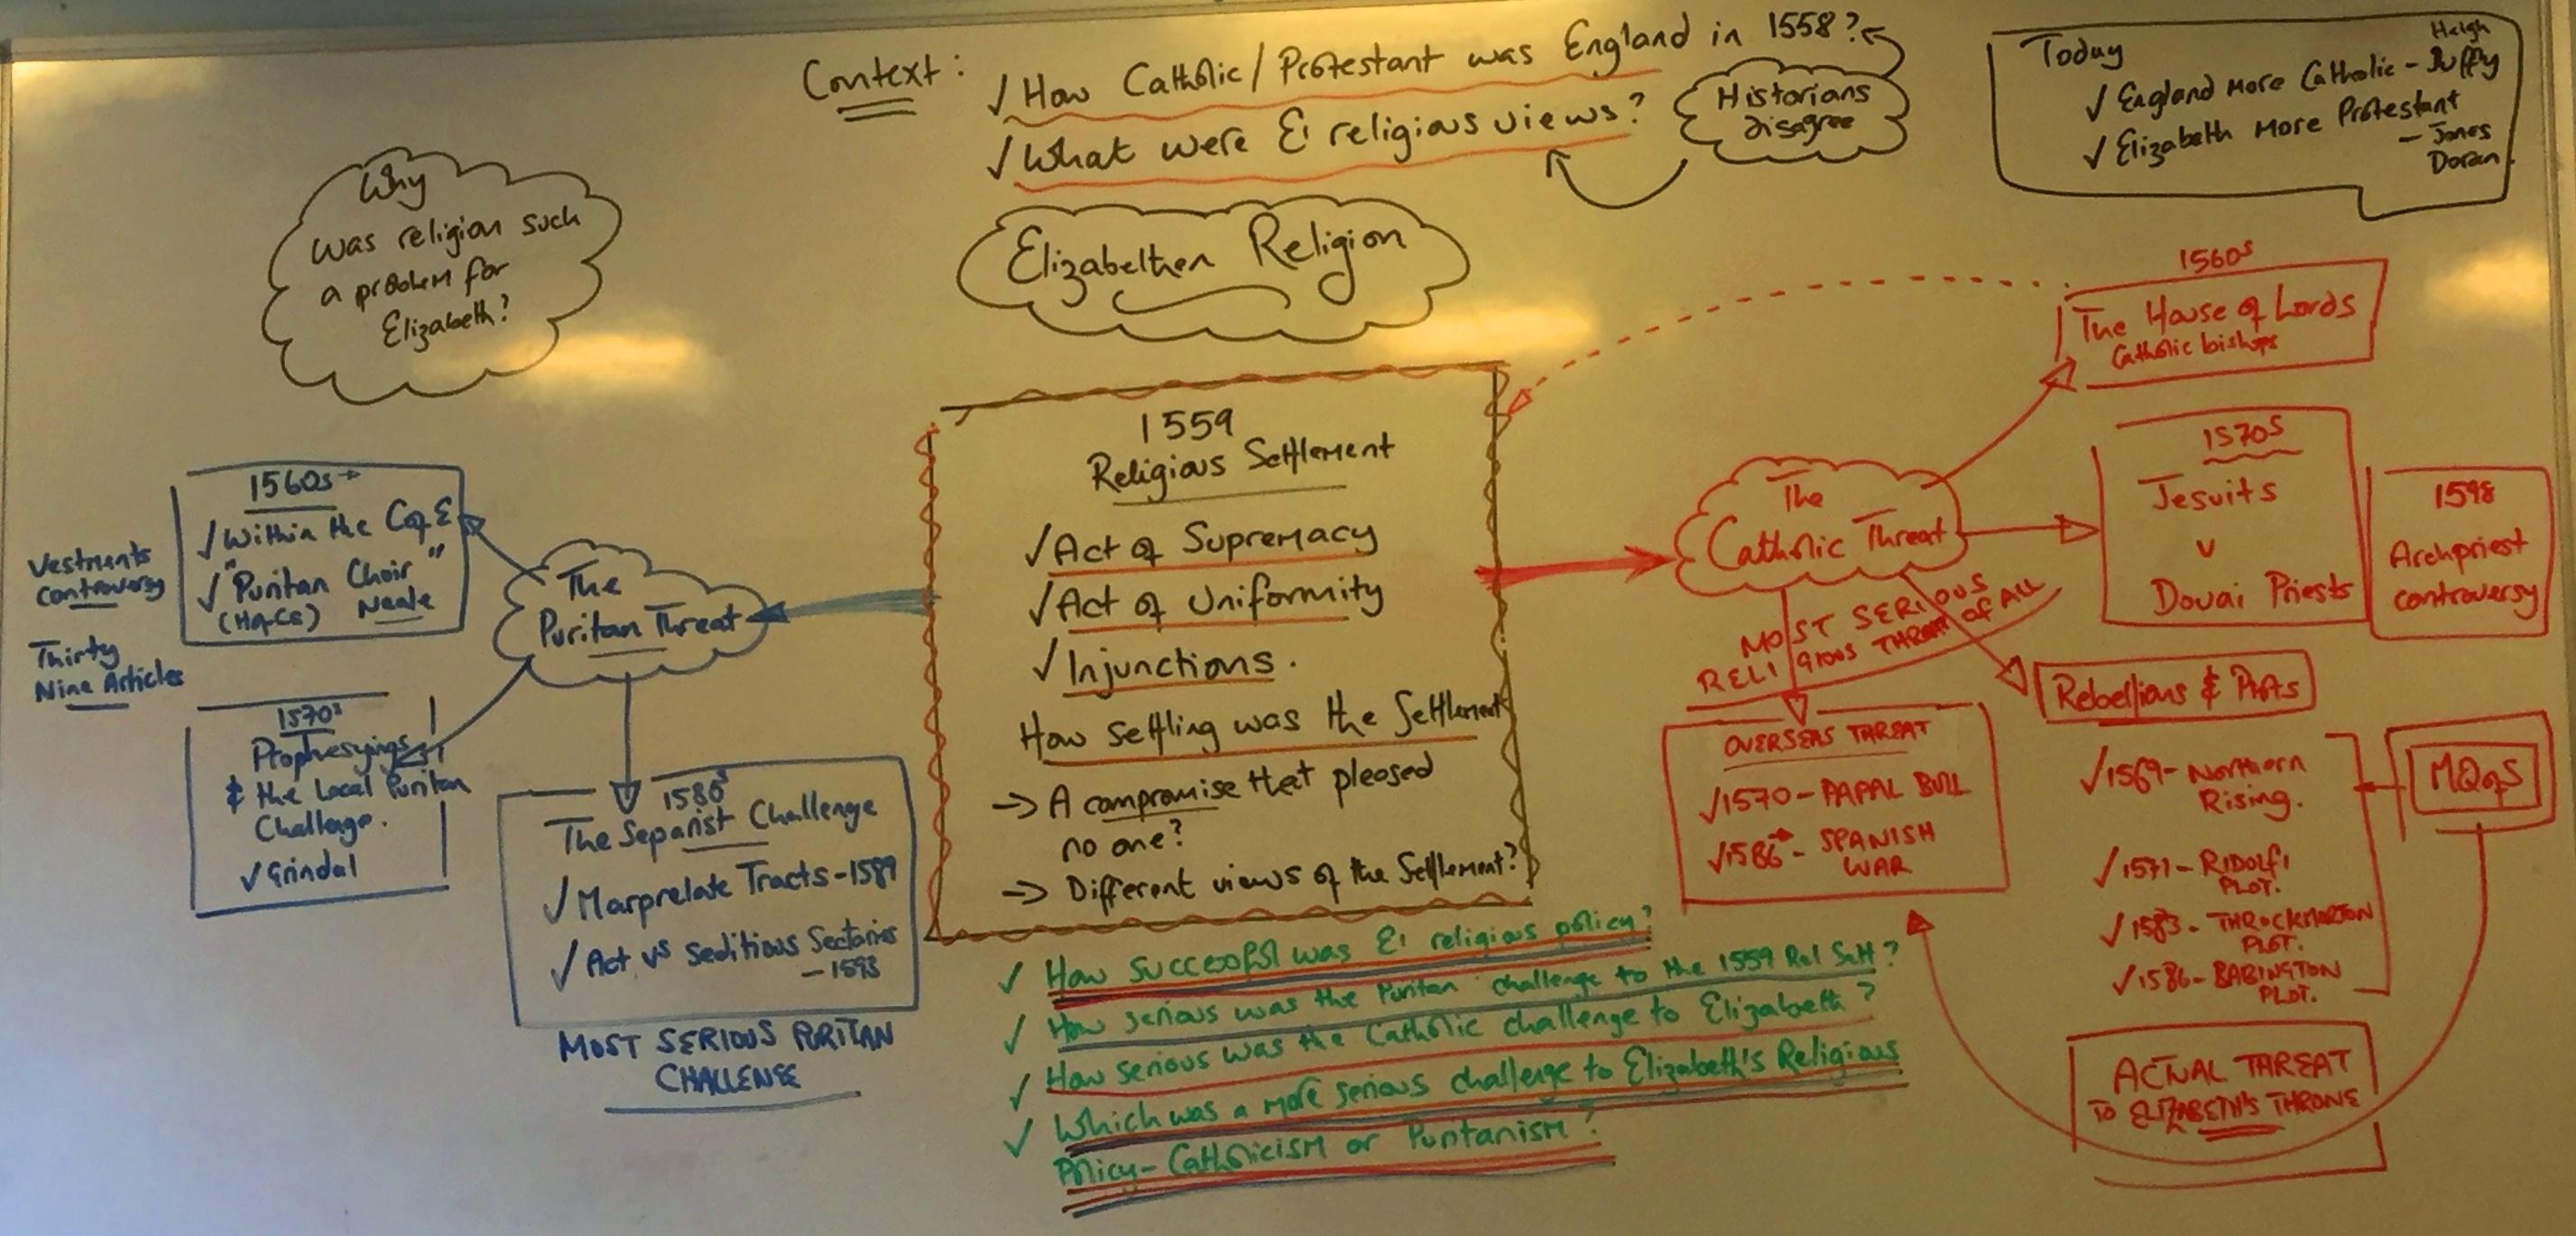 terrorism research paper topics